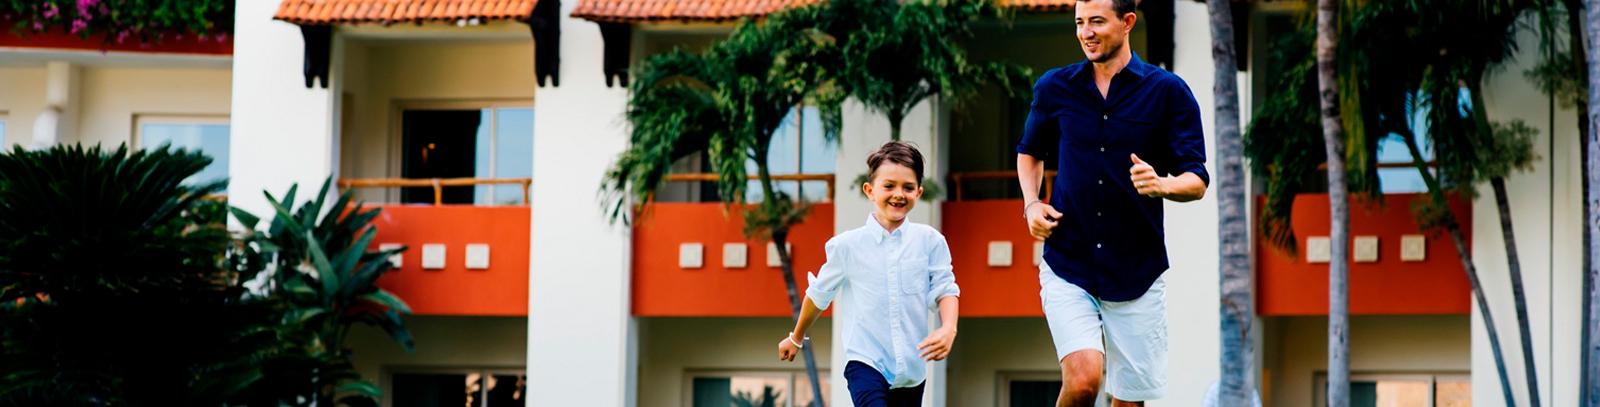 Kids Free Offer at Grand Velas Riviera Nayarit